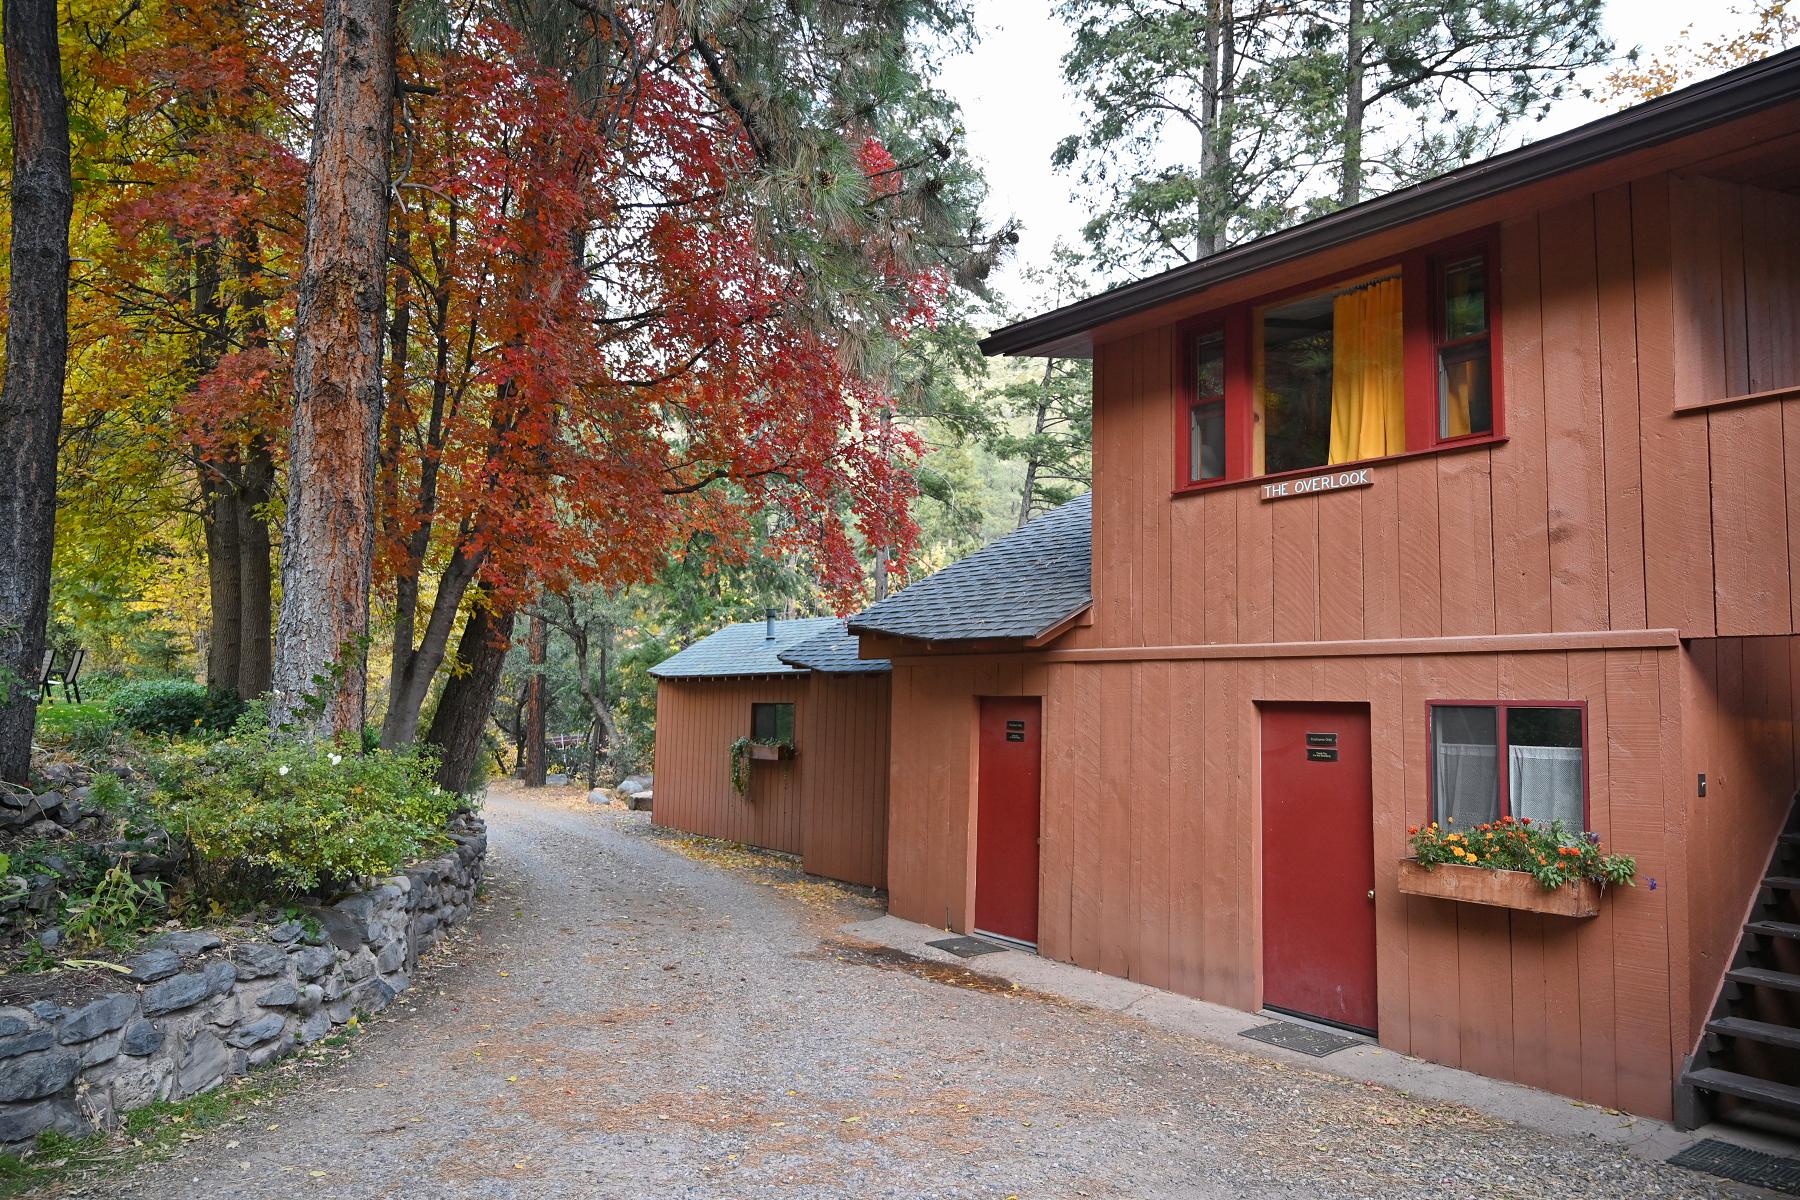 overlook house Forest House Resort Sedona Exterior